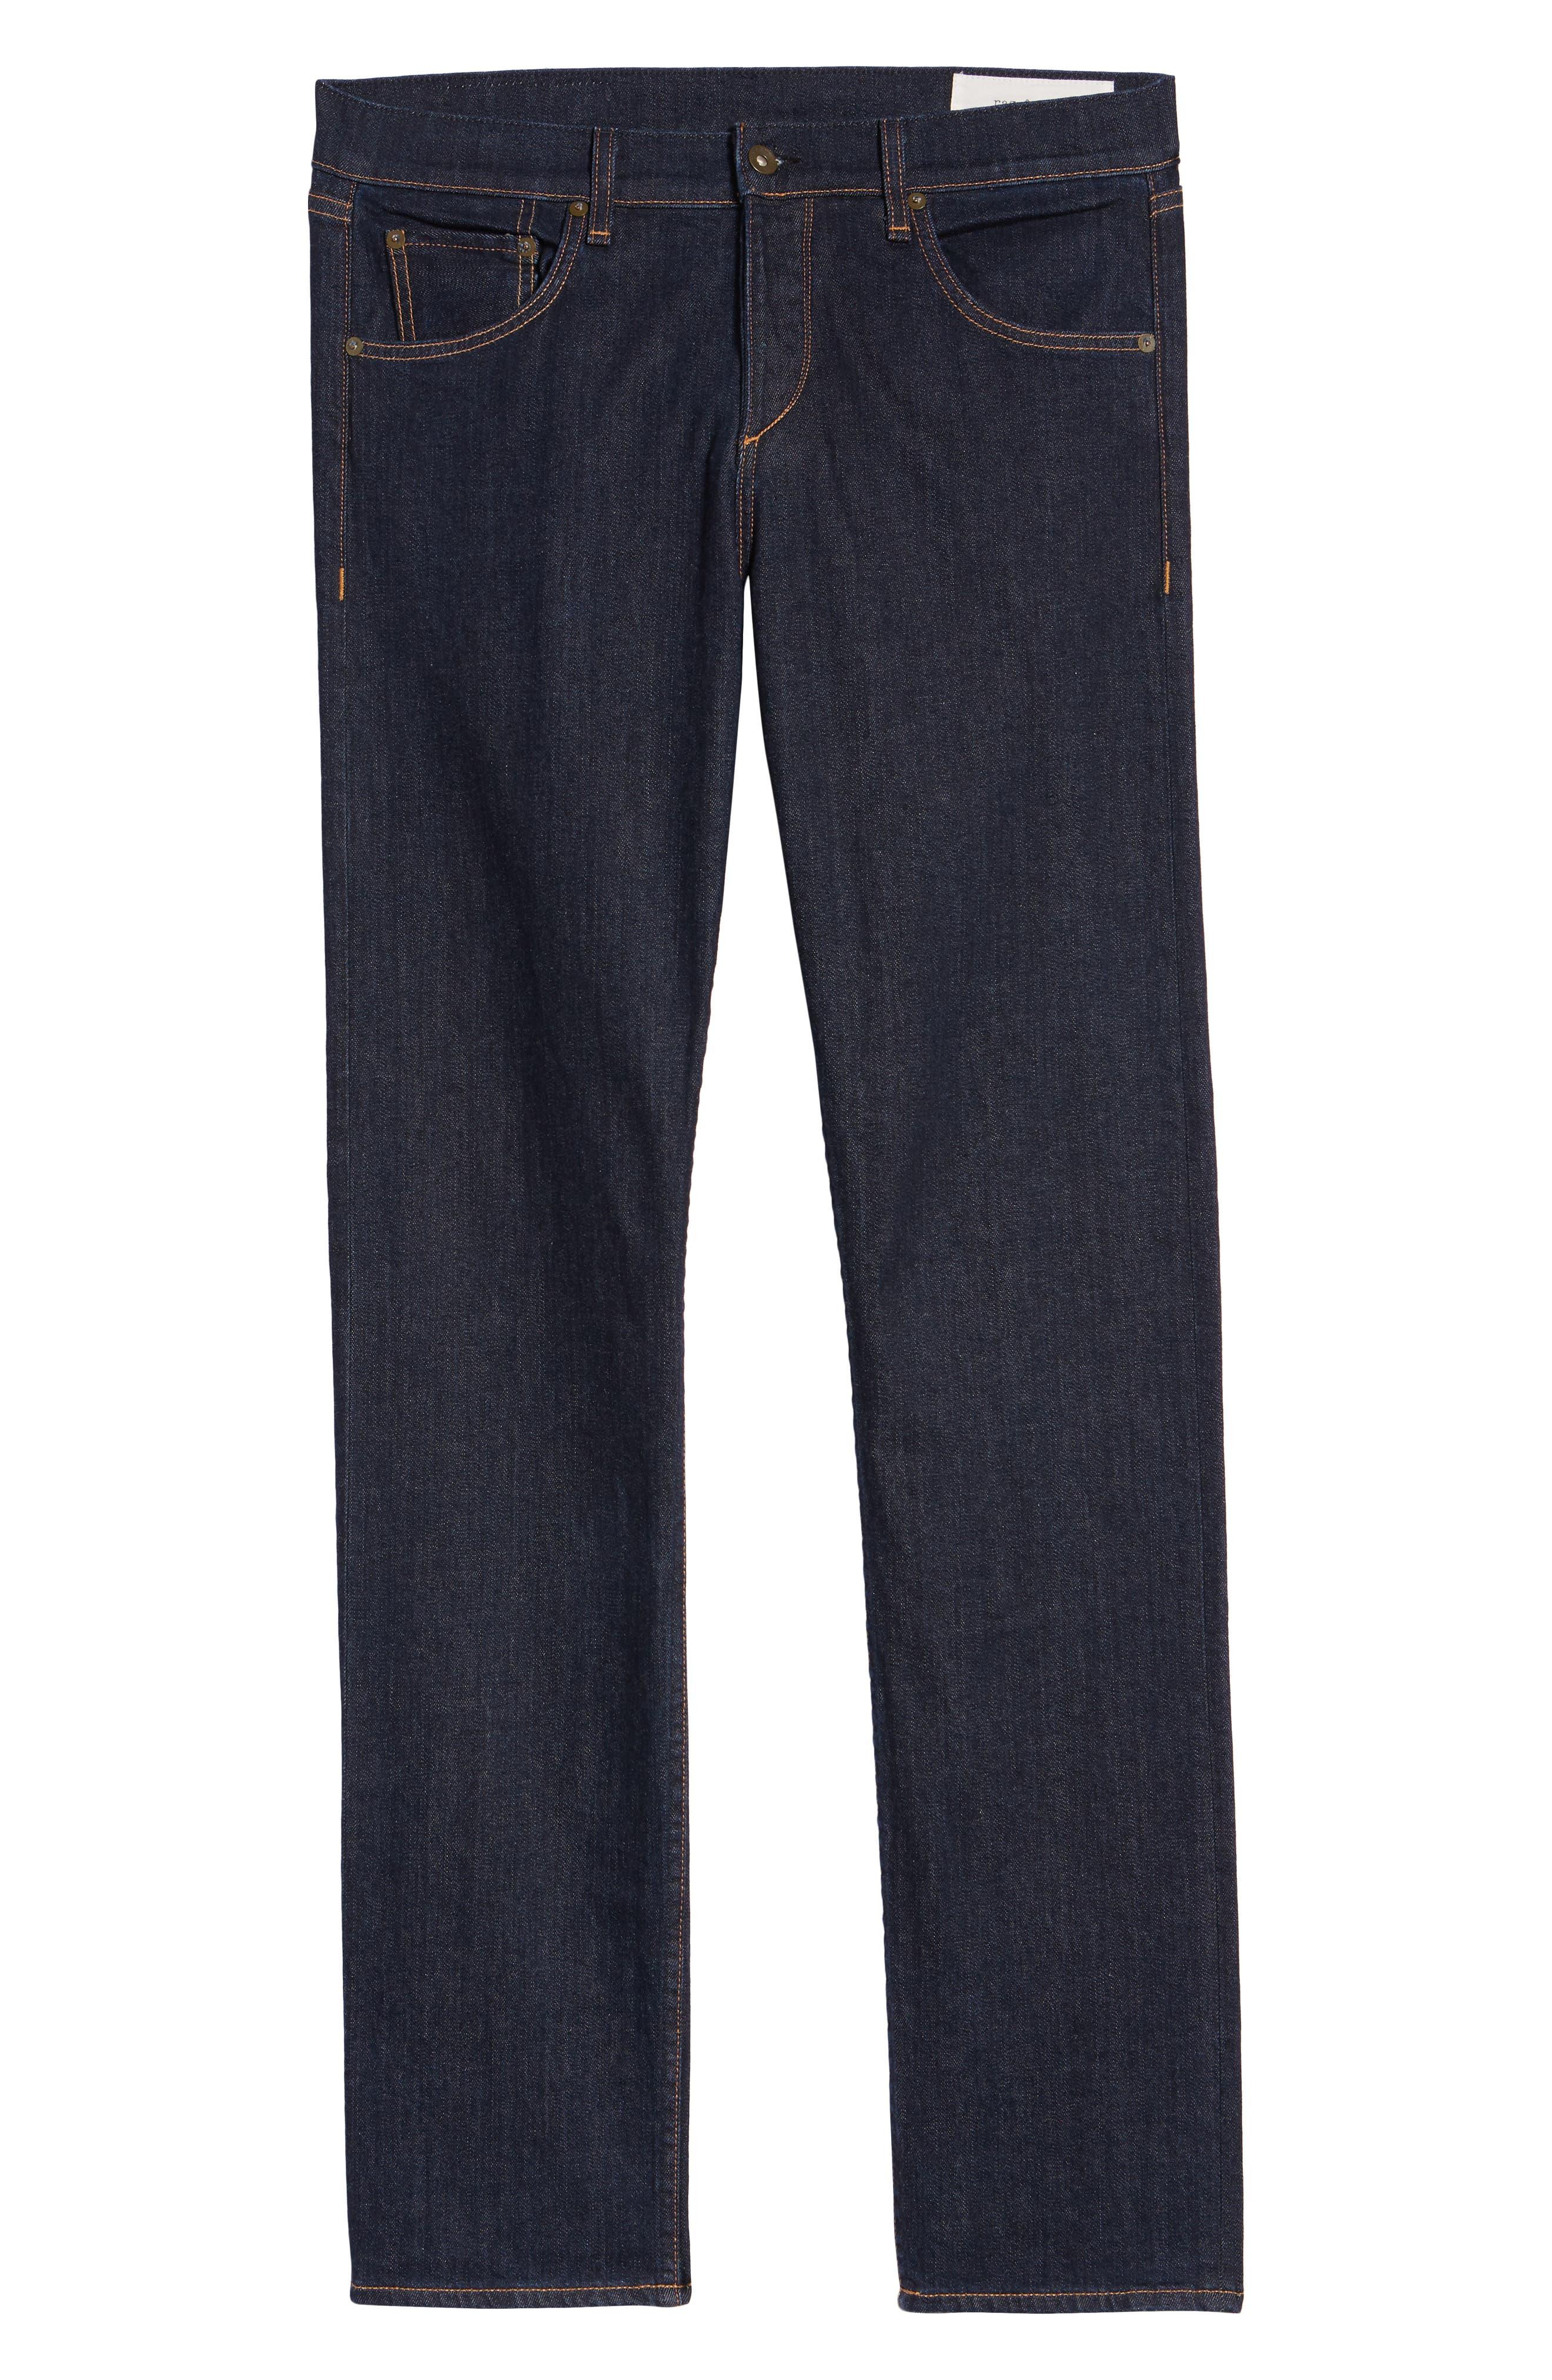 Standard Issue Fit 3 Slim Straight Leg Jeans,                             Alternate thumbnail 6, color,                             HERITAGE